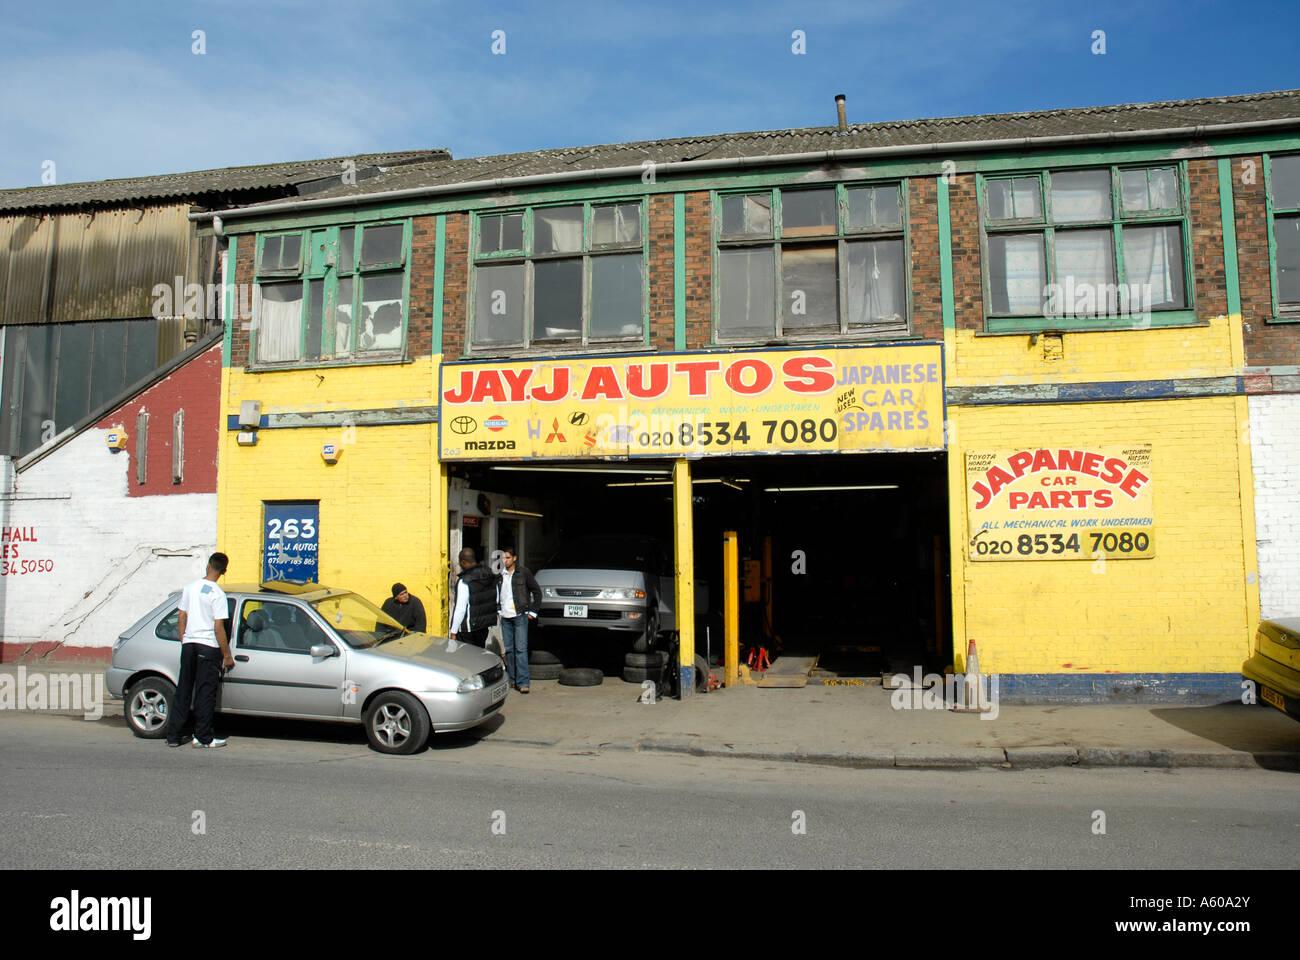 jay j autos motor mechanics garage workshop in carpenters road in jay j autos motor mechanics garage workshop in carpenters road in stratford london